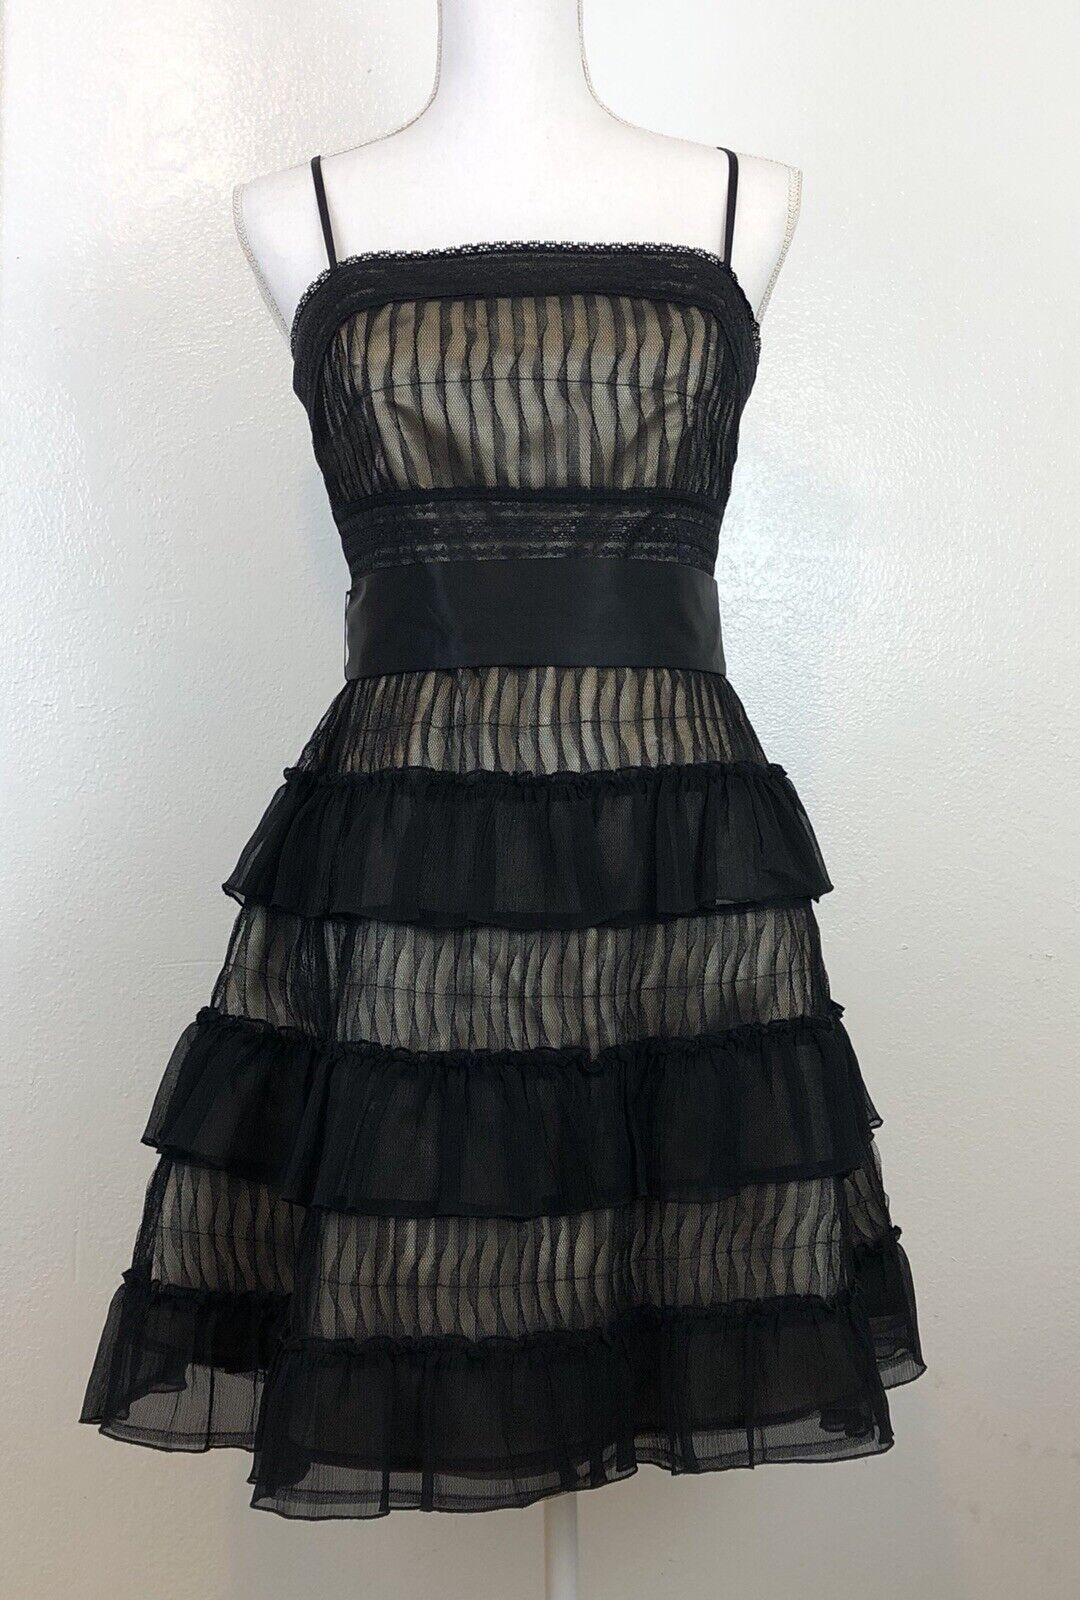 Marciano damen schwarz Dress Medium Silk Lace Romantic Cocktail Statement